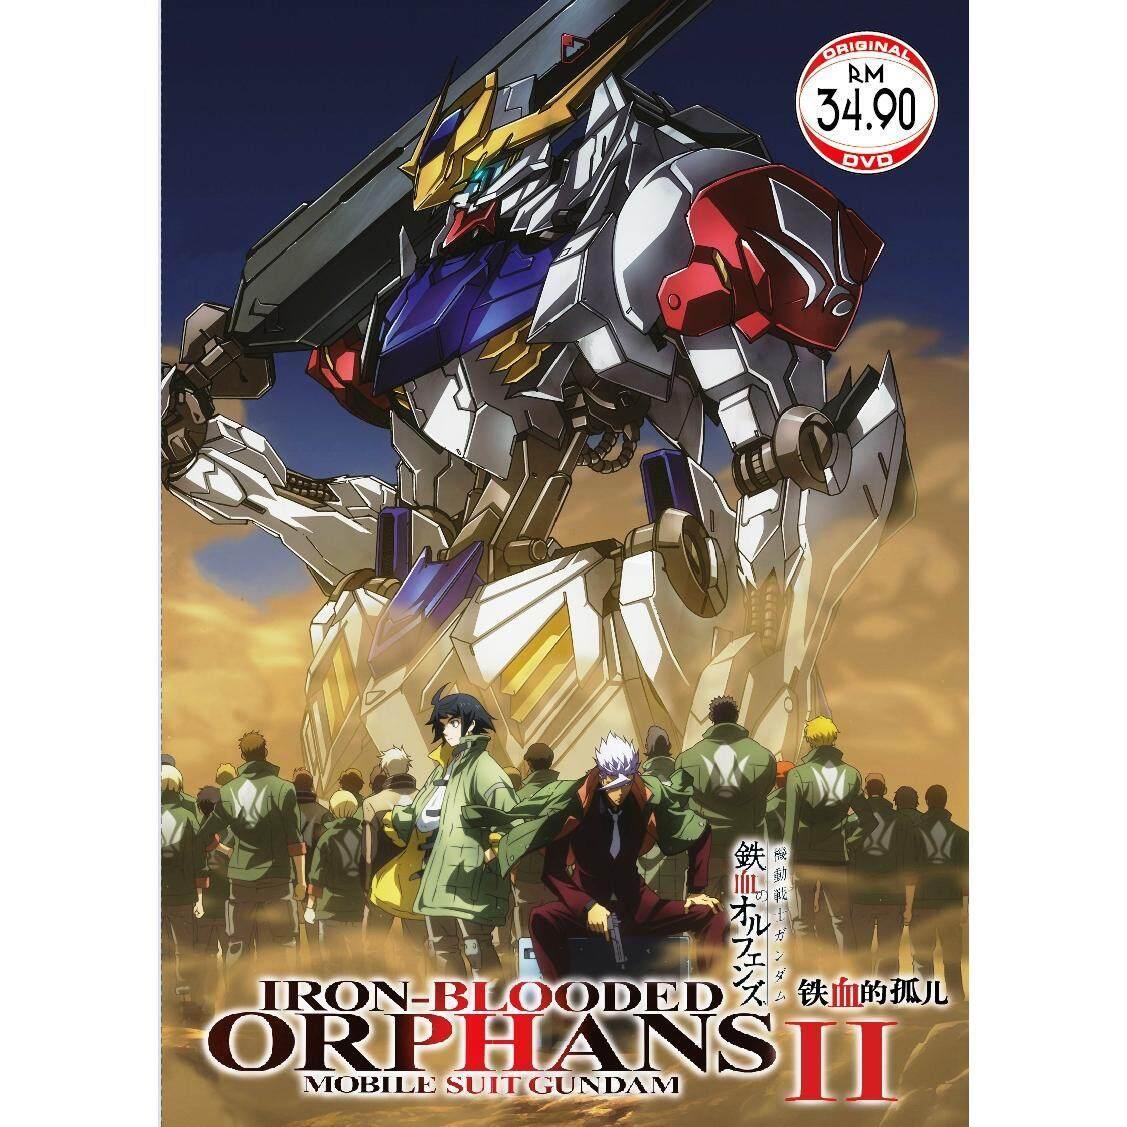 Gundam Iron Blooded Orphans Season 2 Anime DVD